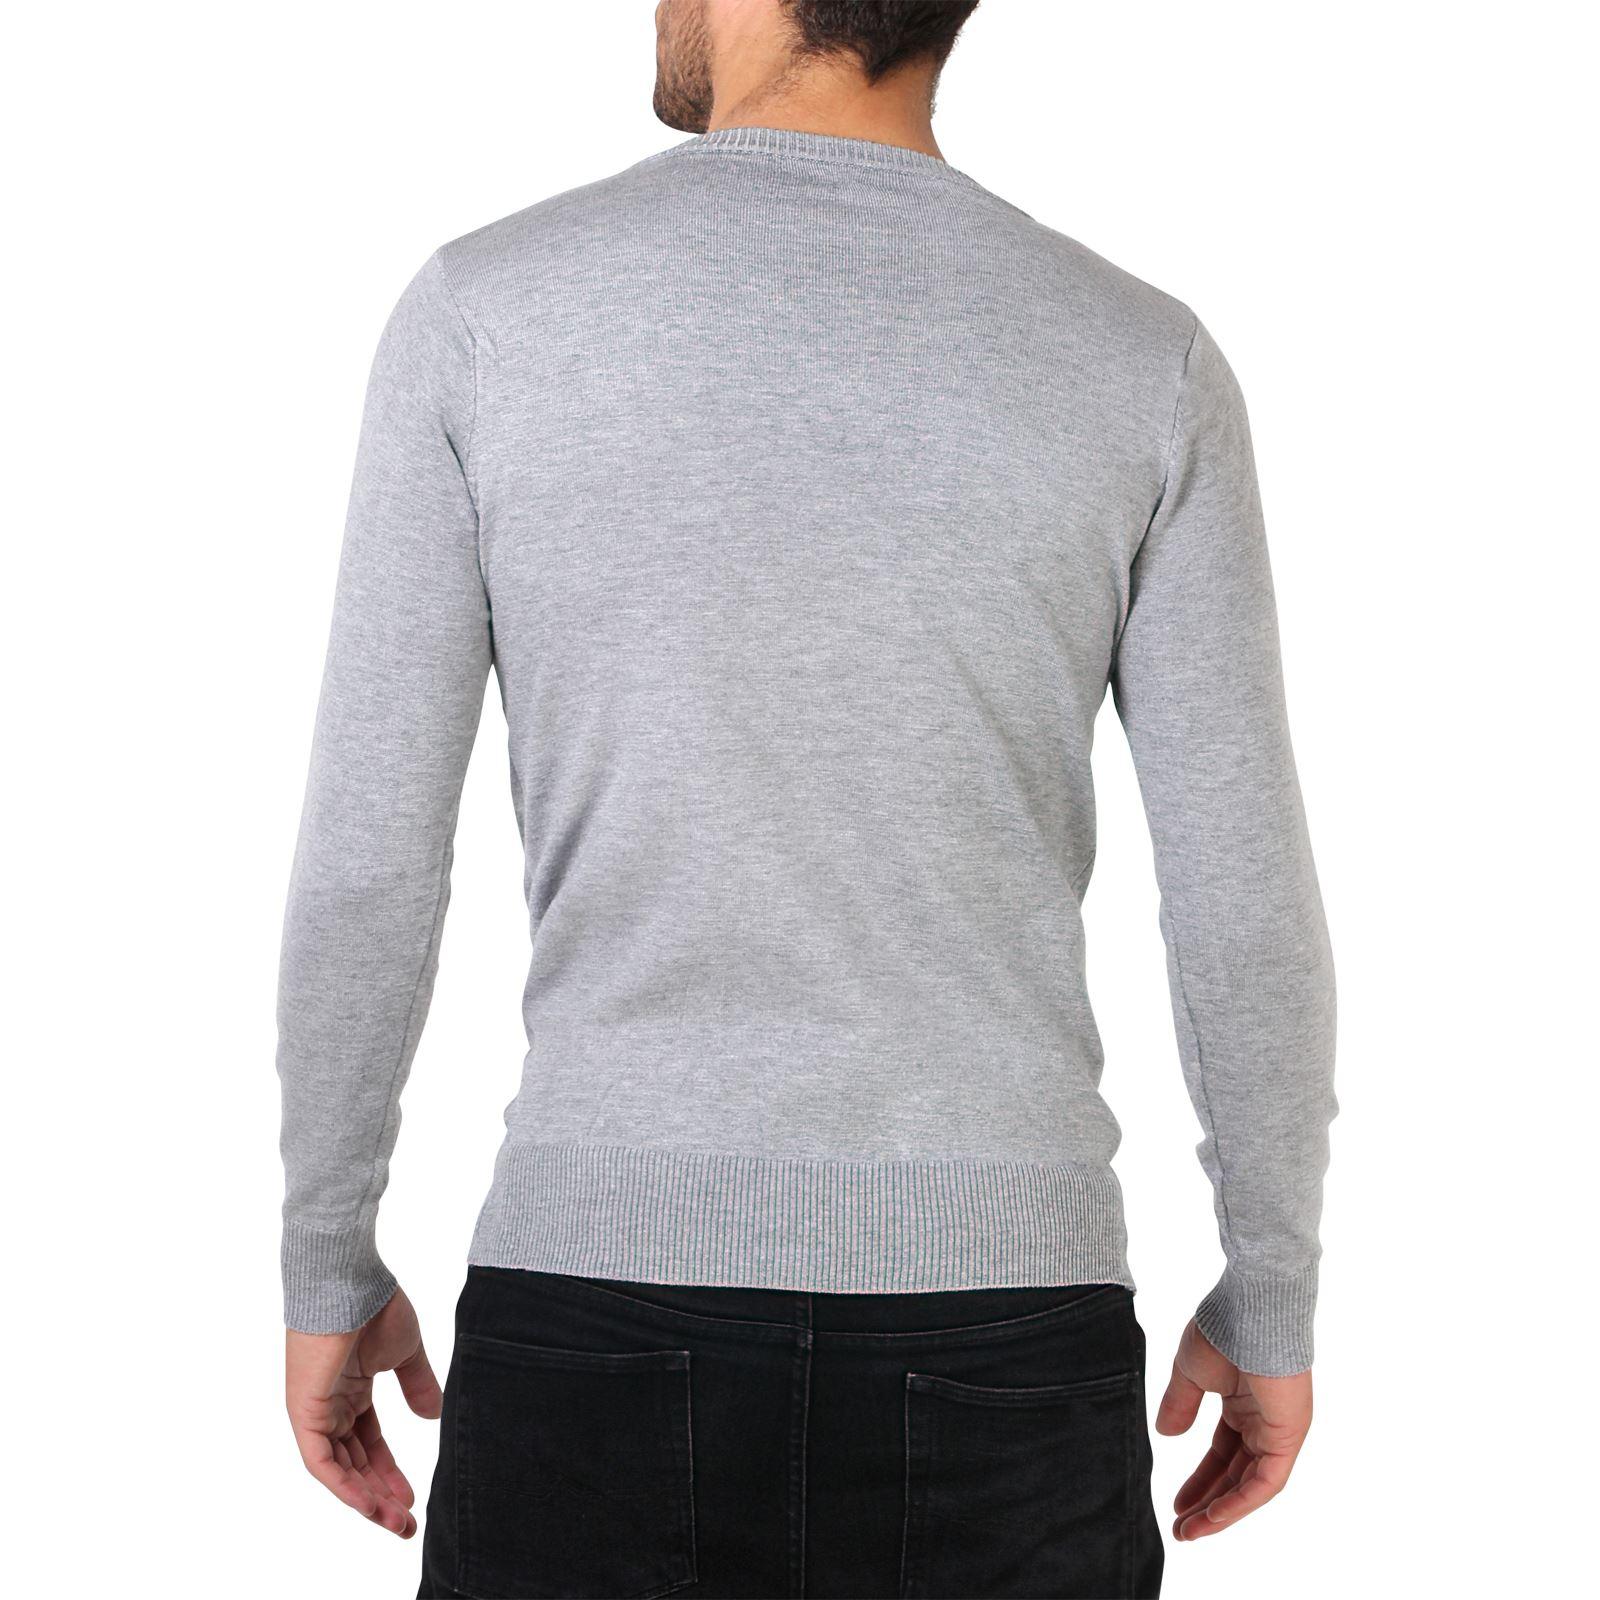 376925bb2110 Mens Soft Cotton Knit Plain V Neck Fashion Jumper Knitwear Sweater ...